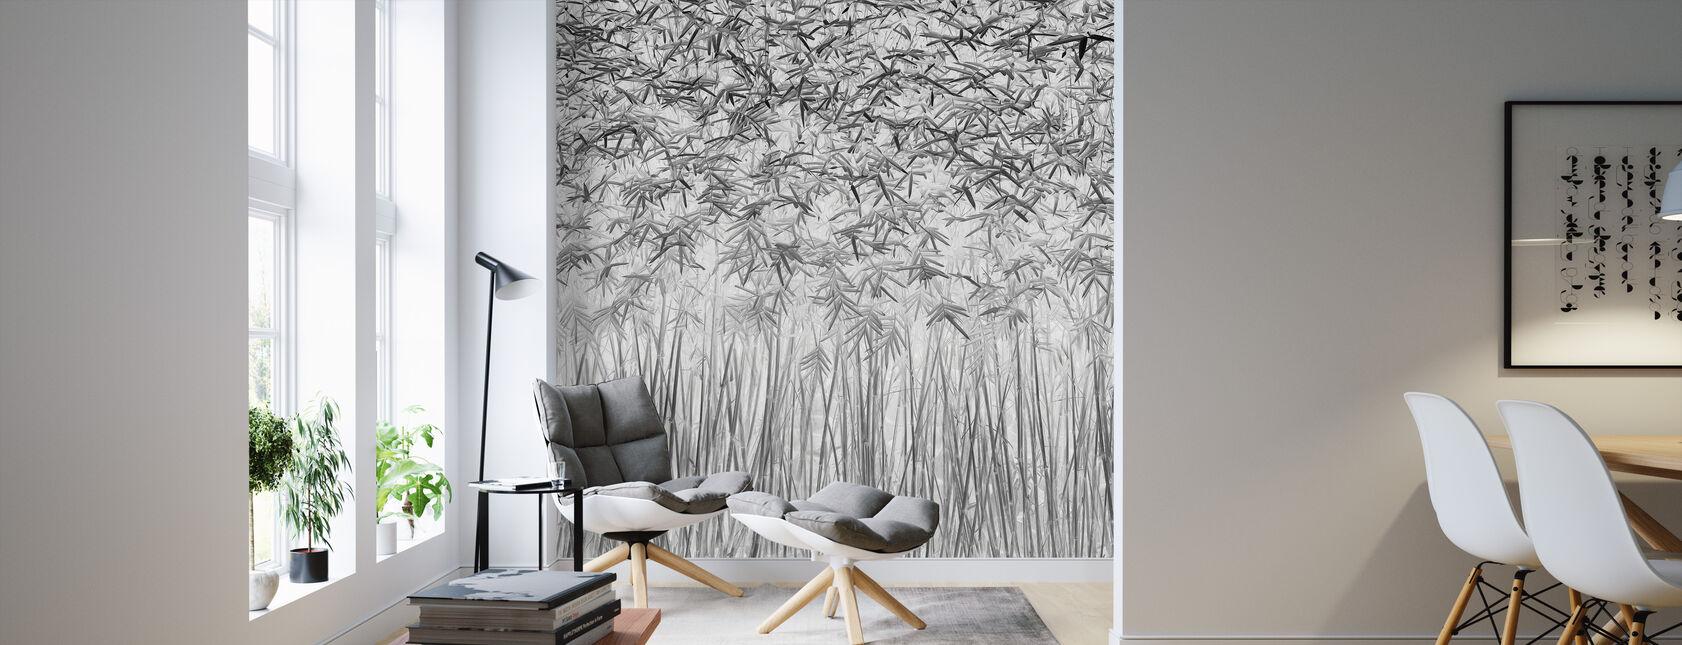 Parallelism - Wallpaper - Living Room